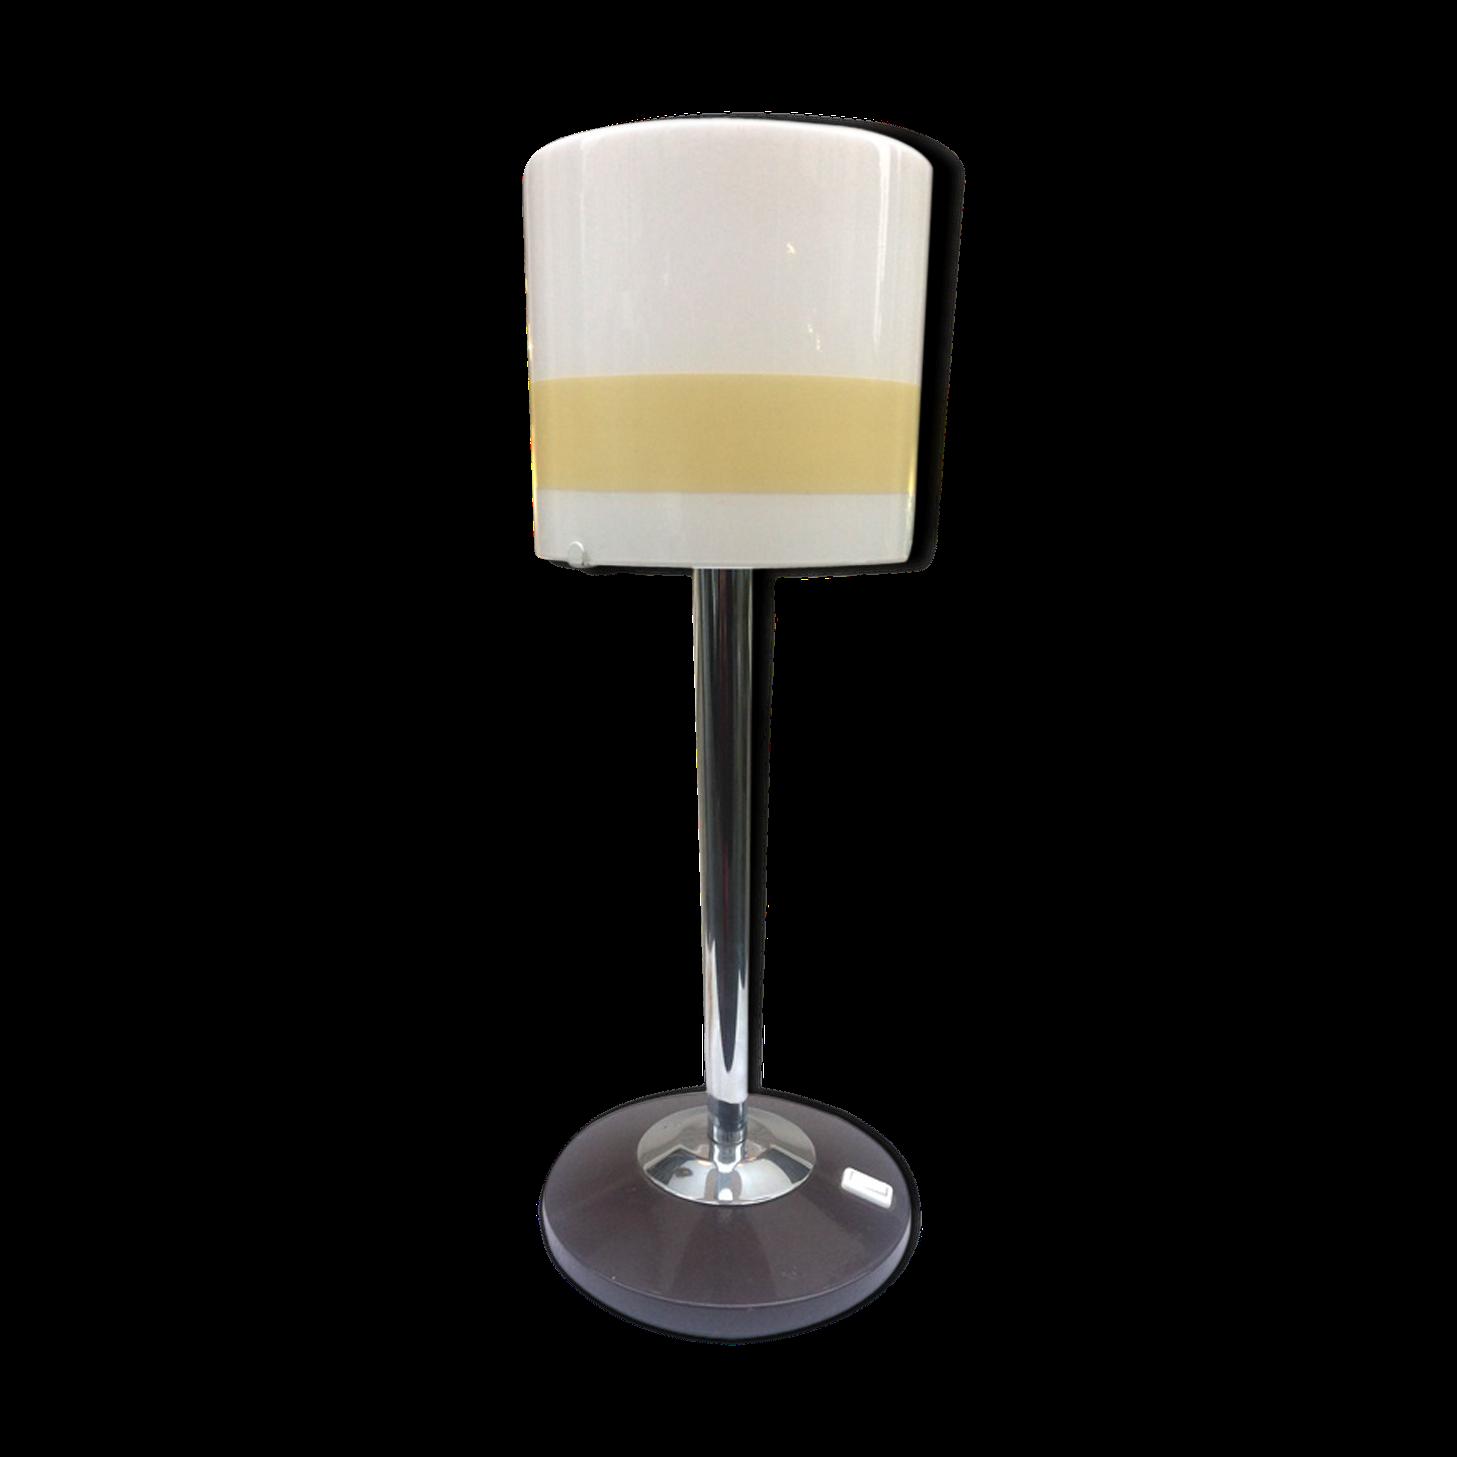 lampe italienne design amazing lampe italienne eclisse de vico magistretti pour artemide with. Black Bedroom Furniture Sets. Home Design Ideas